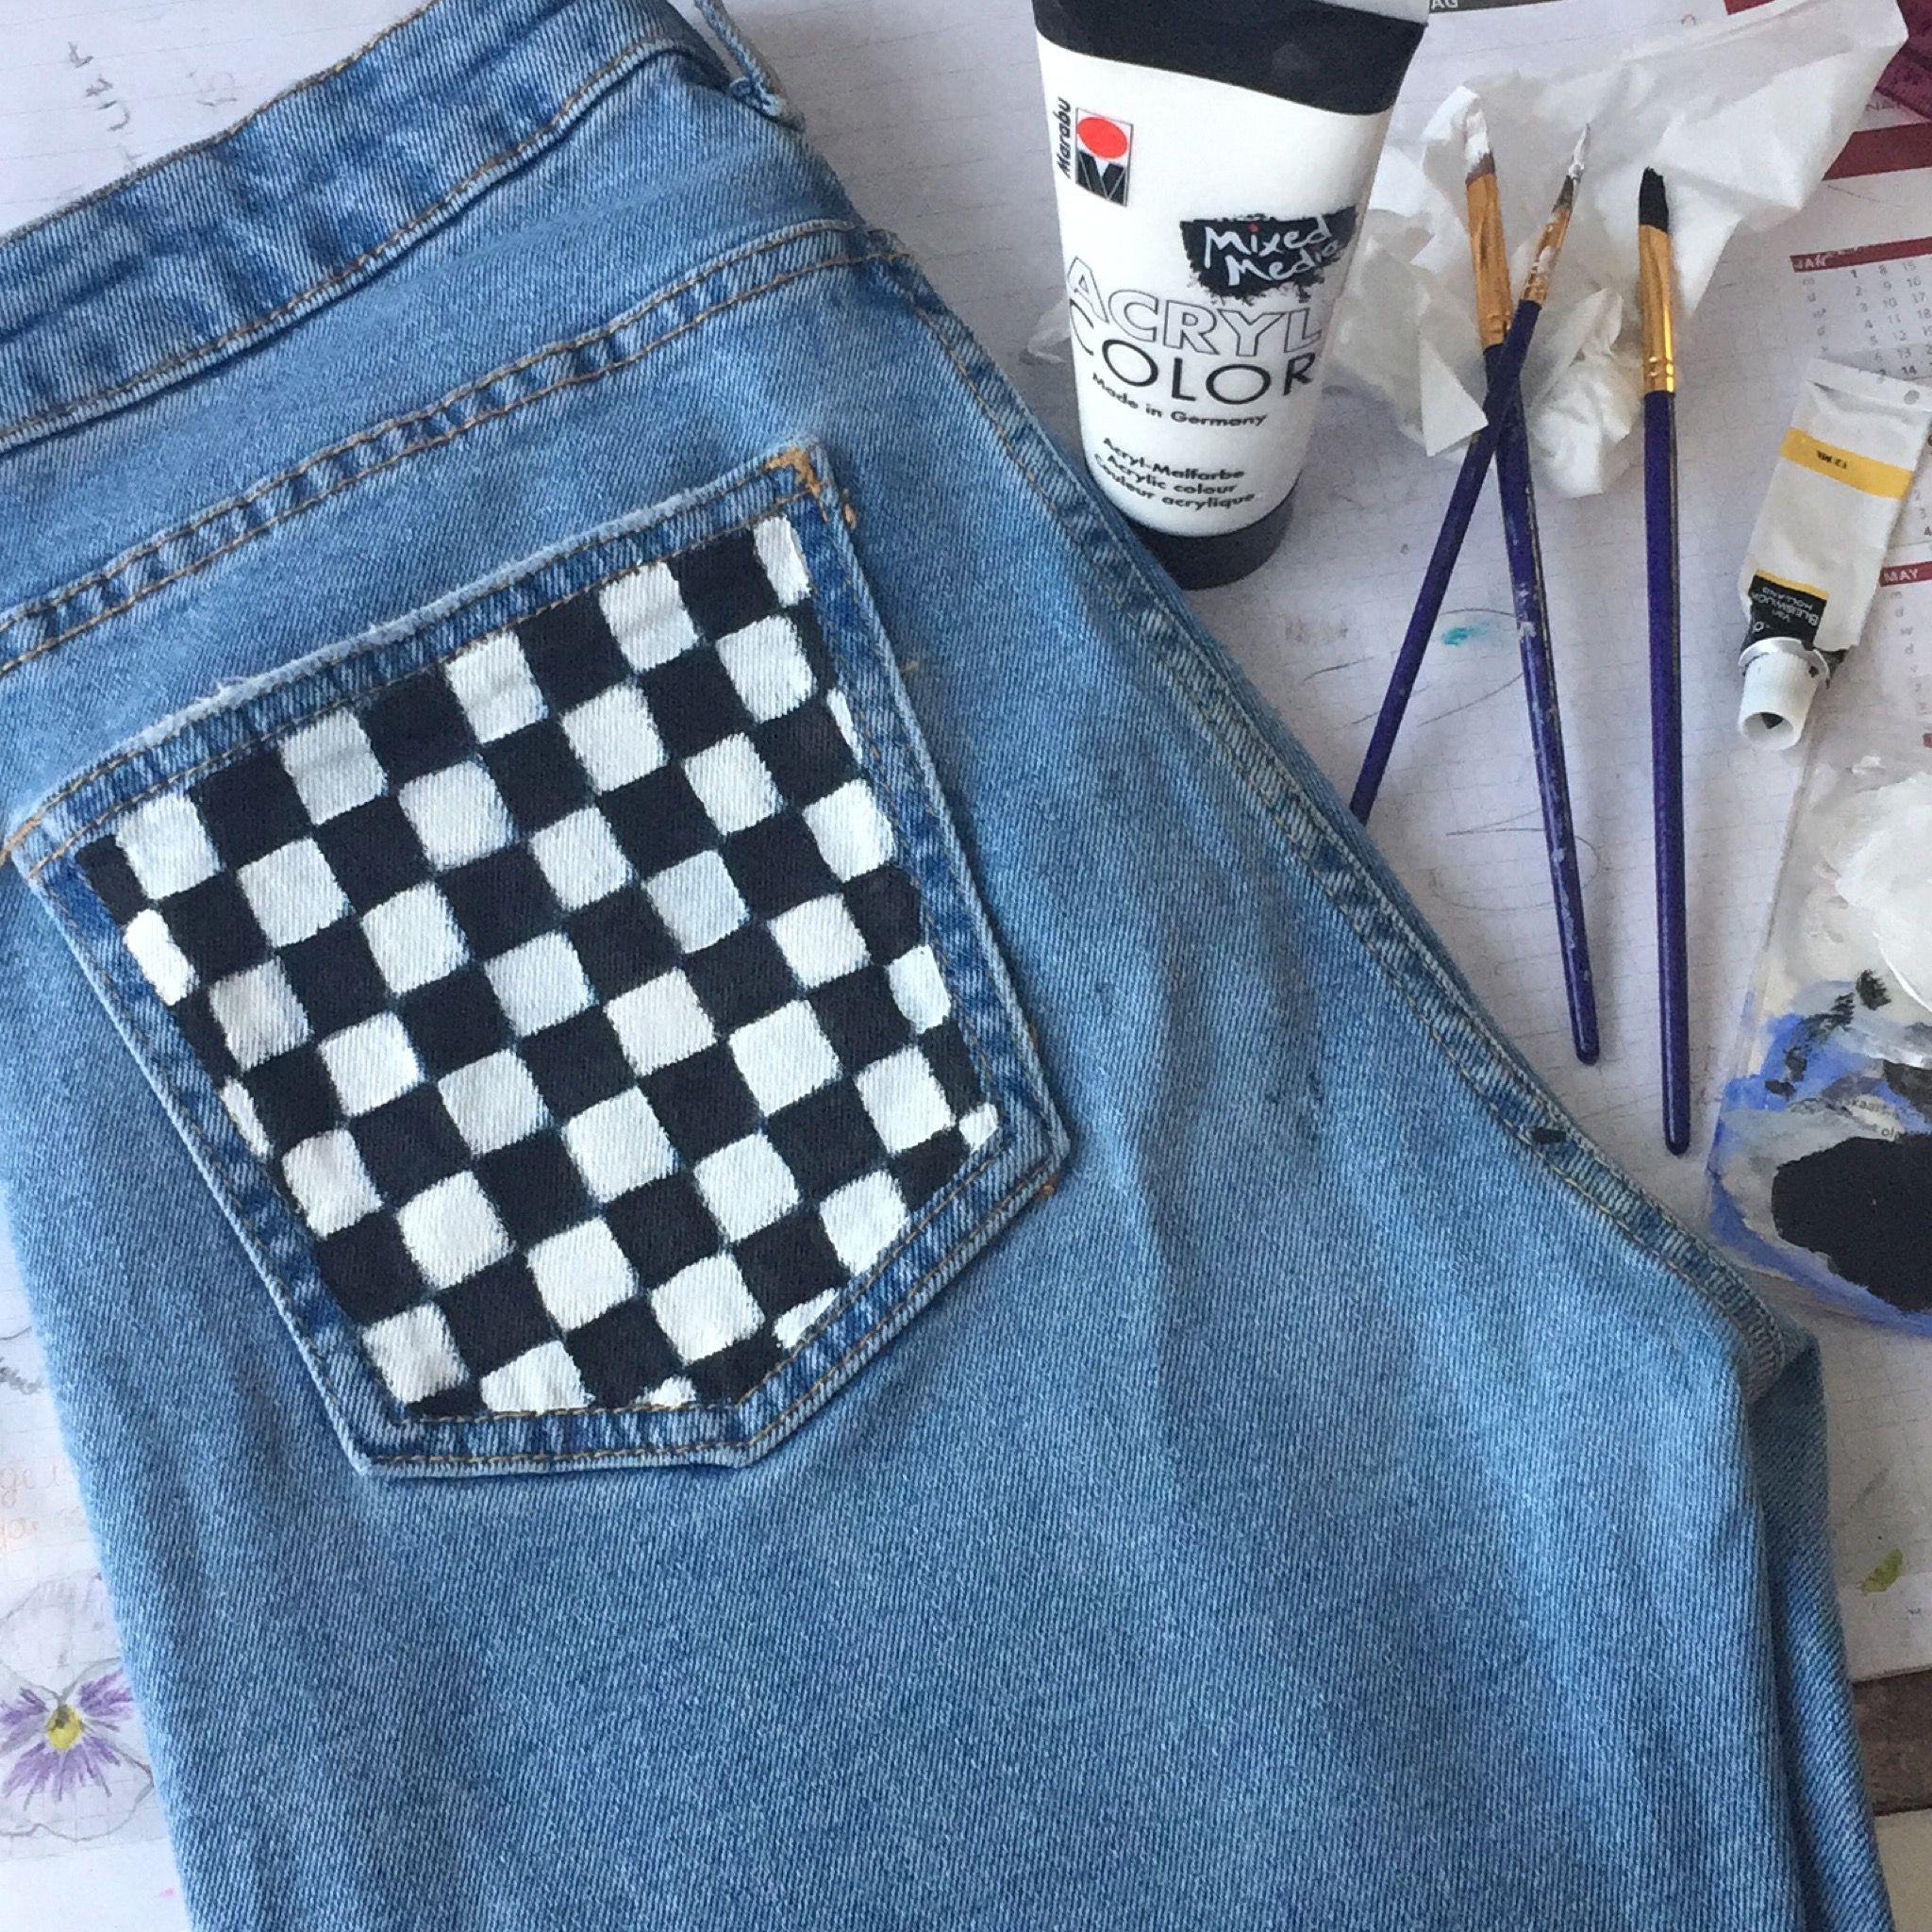 Painted Jeans Painted Clothes Diy Denim Diy Diy Fashion